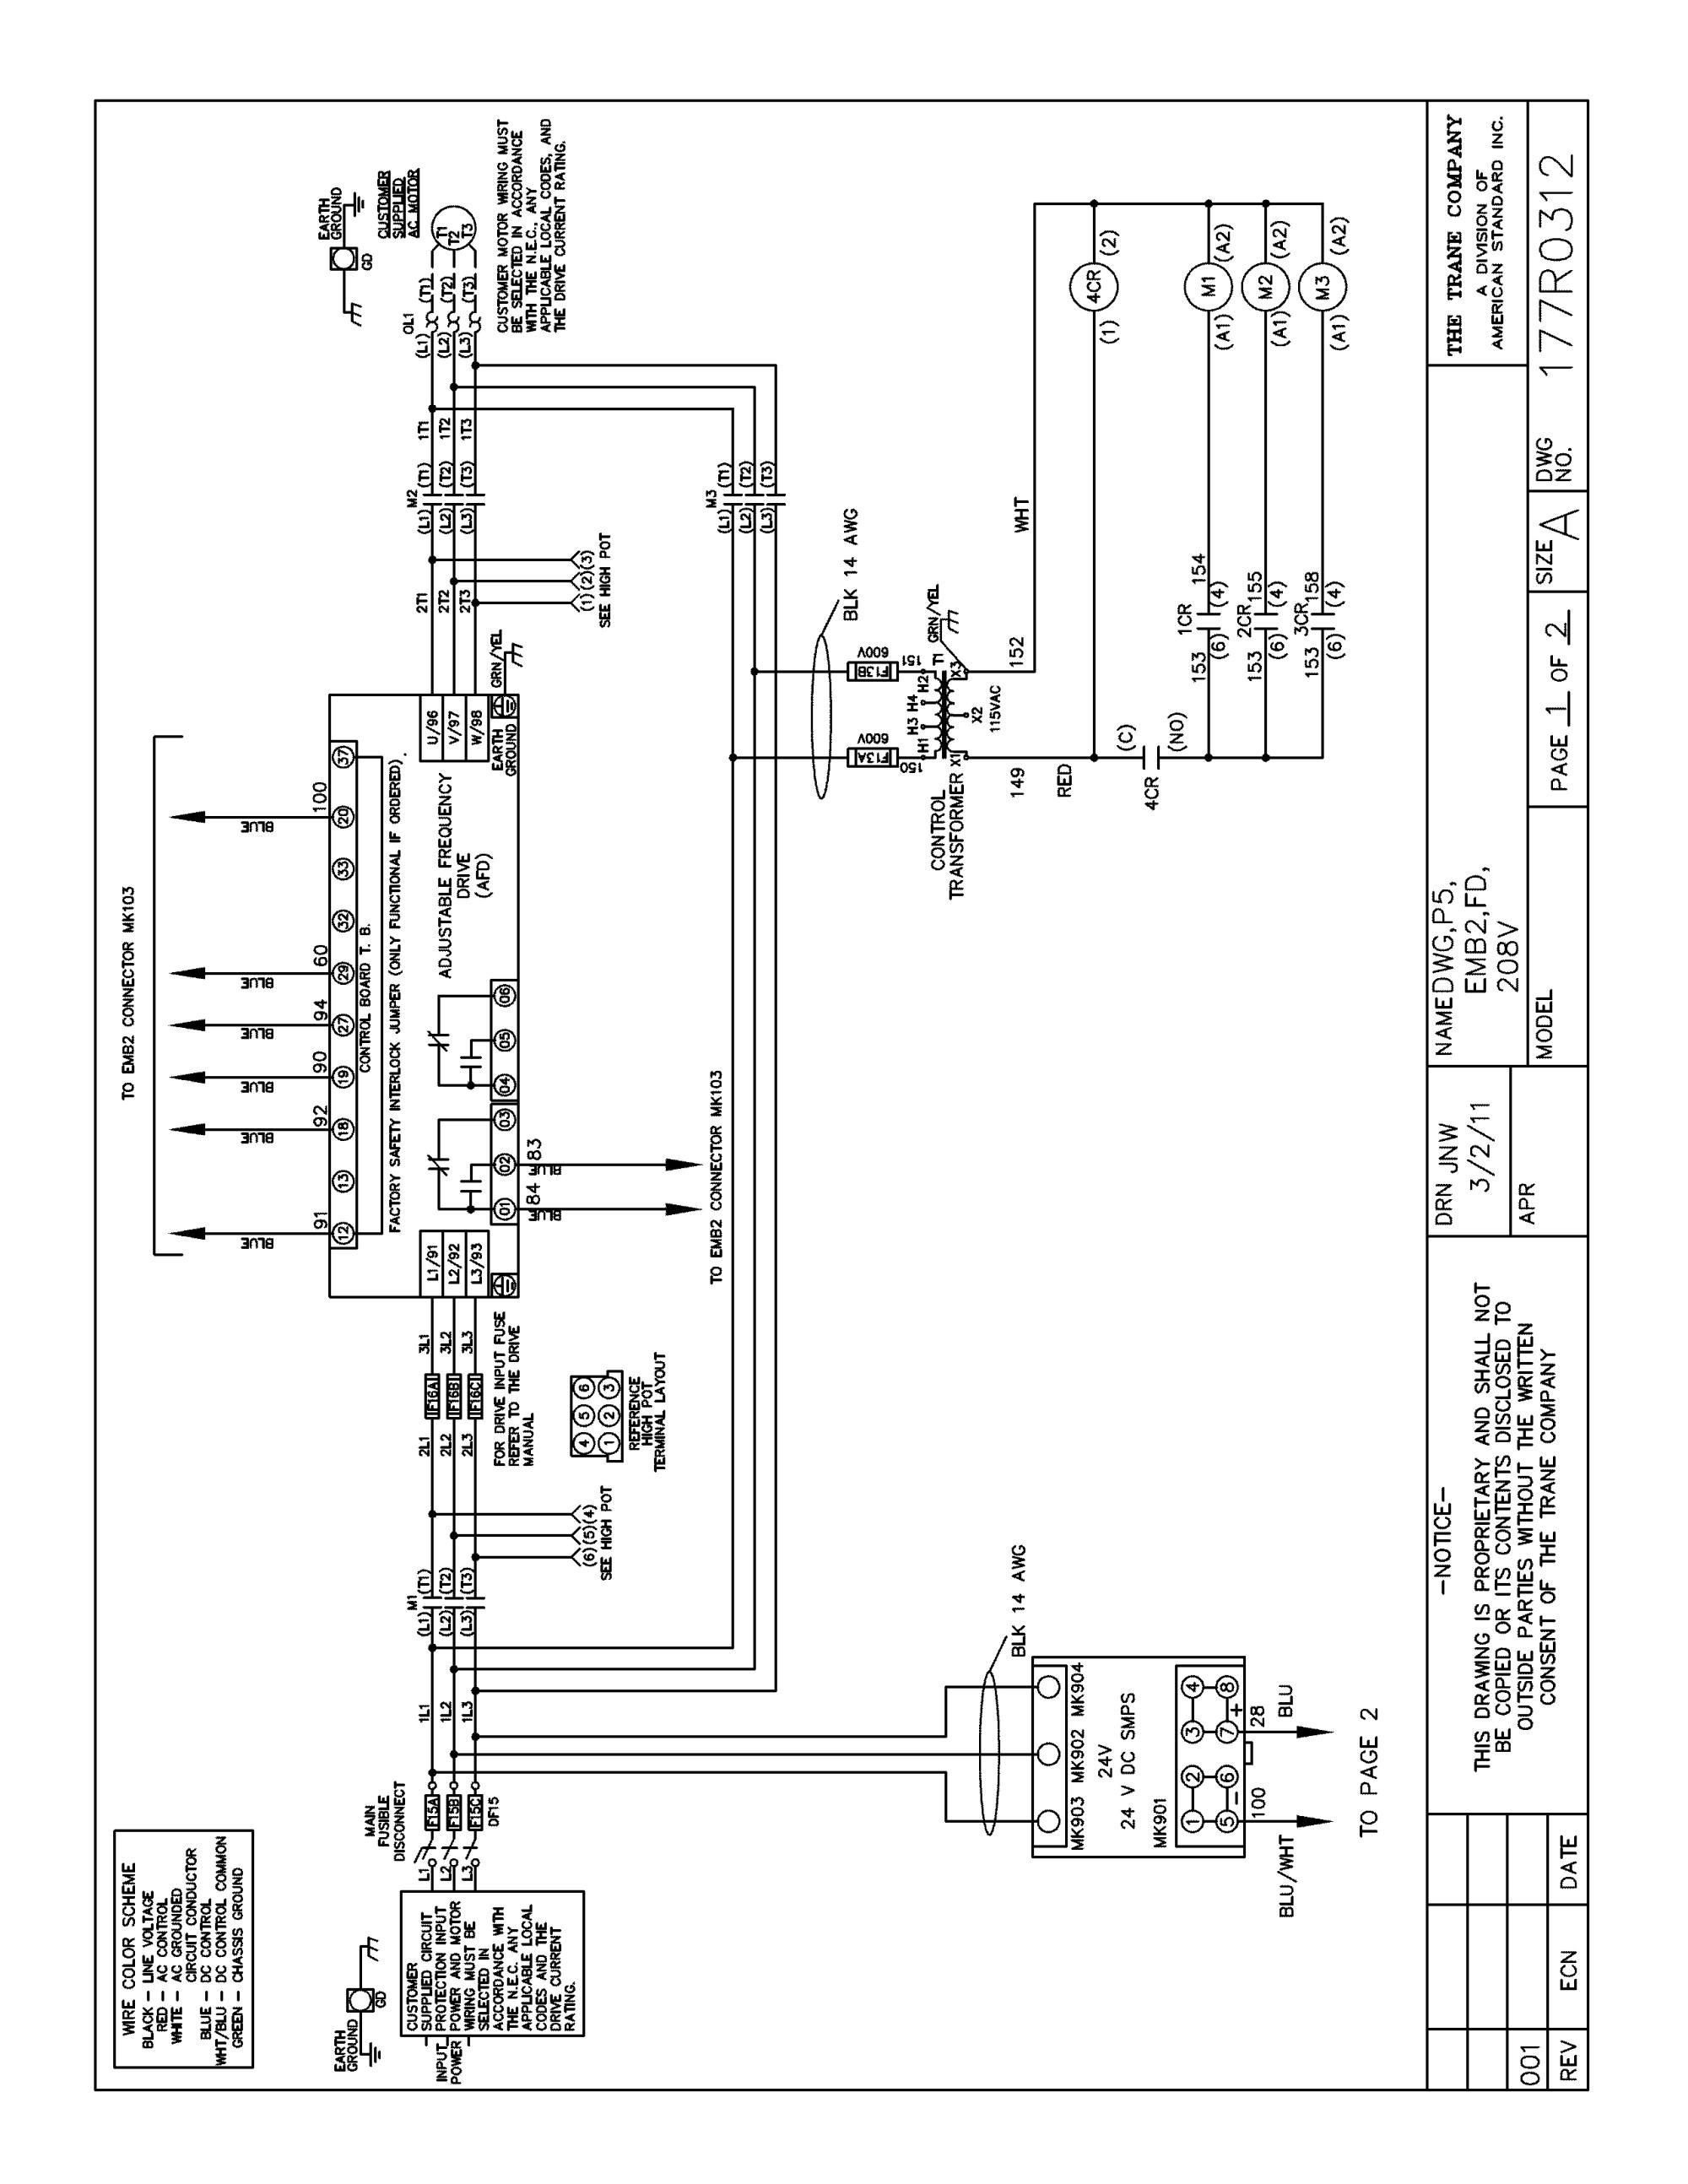 hight resolution of 677 beam wiring diagram wiring diagram advance photoelectric wiring diagram 677 beam wiring diagram wiring diagram